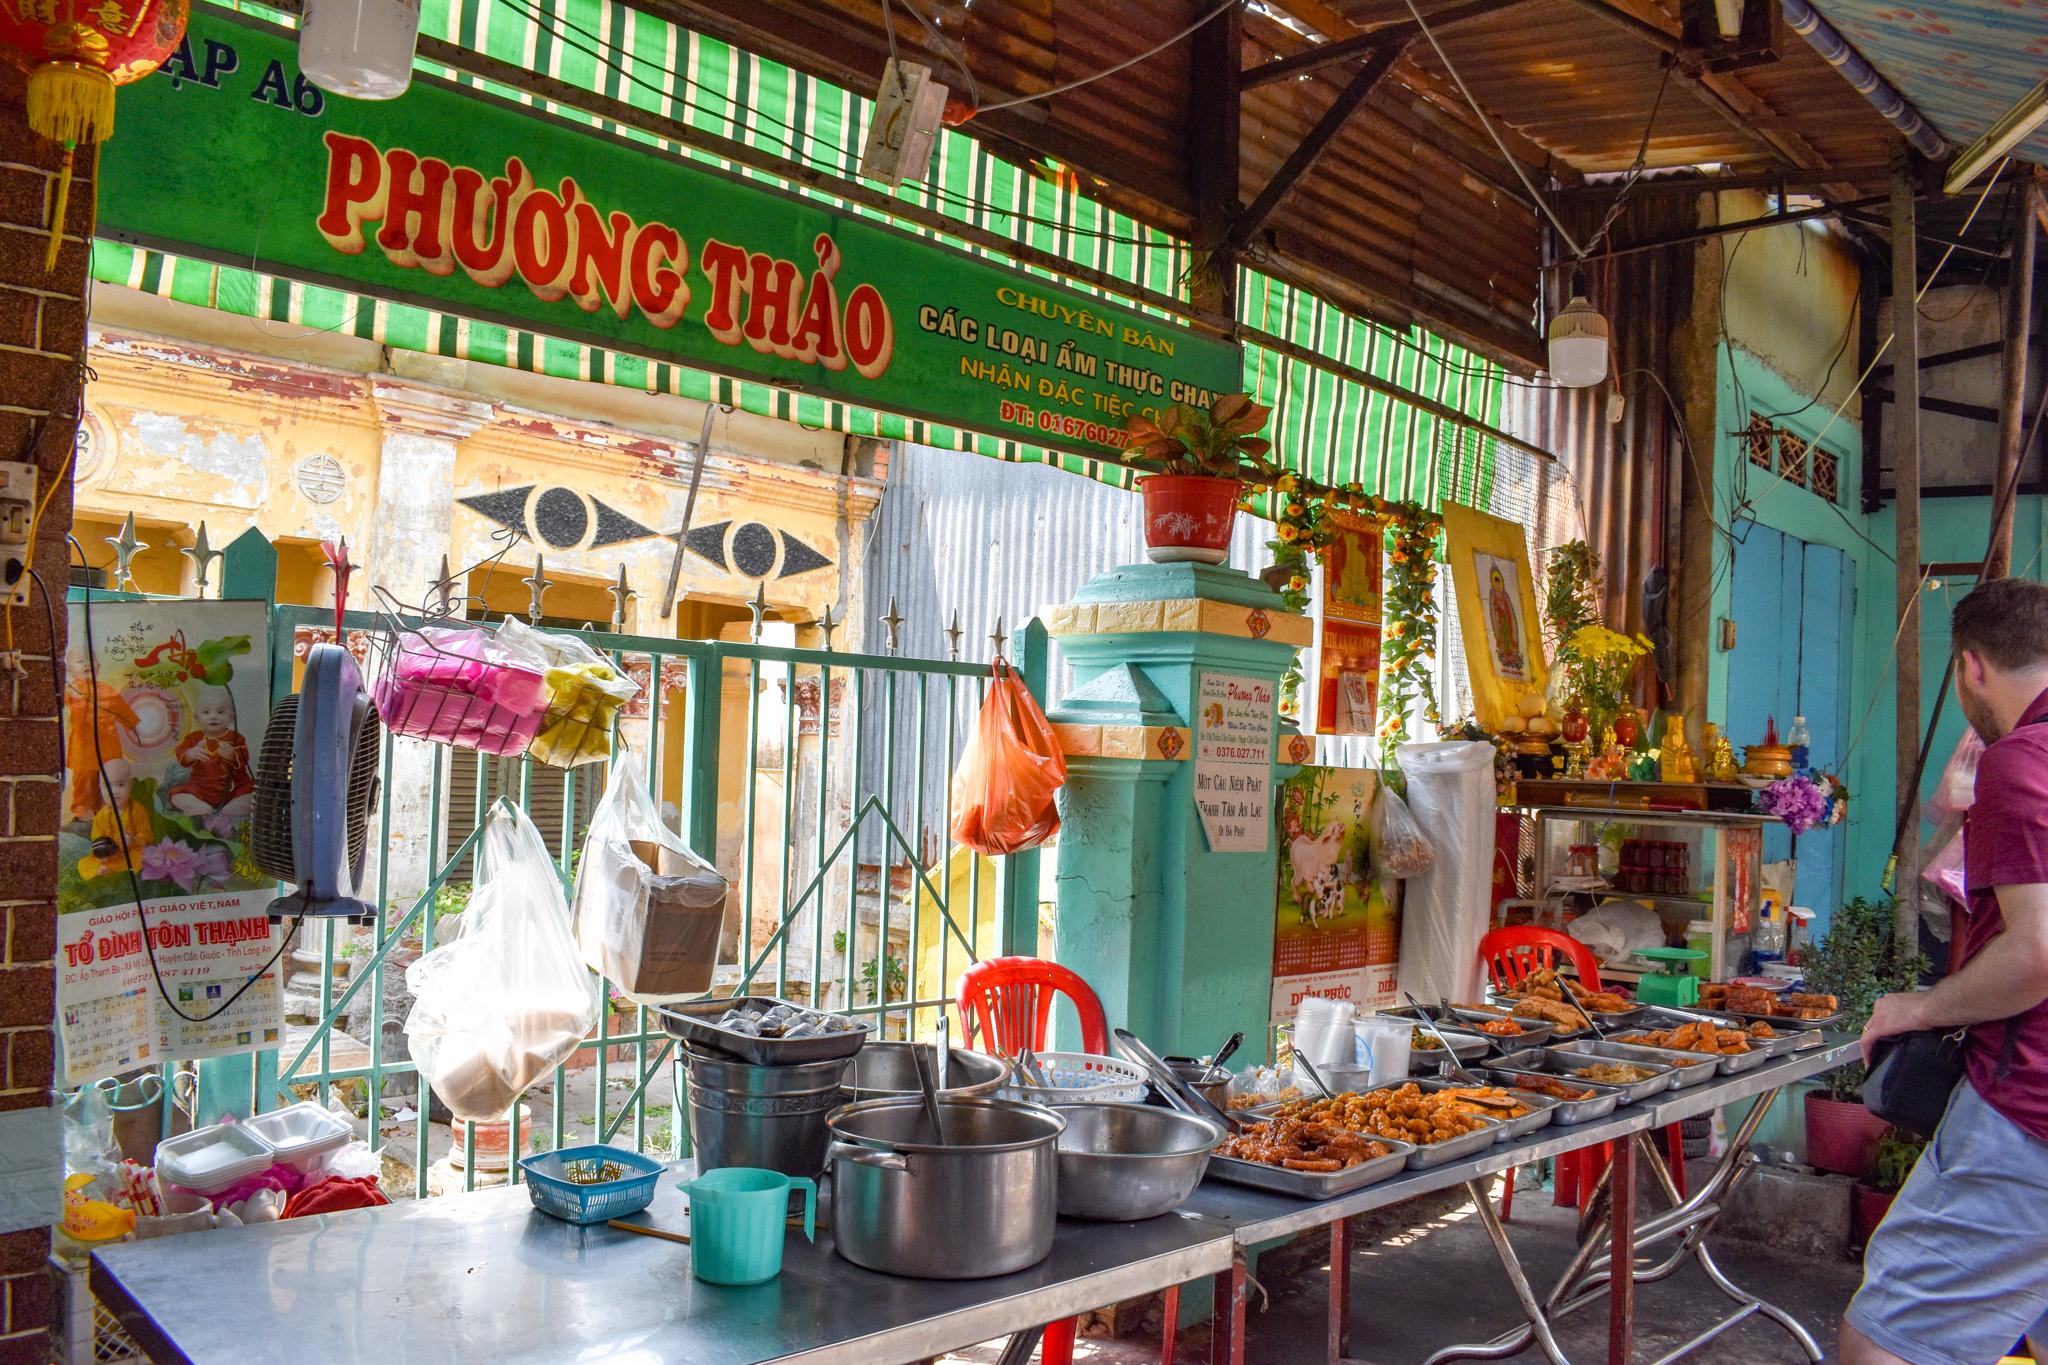 Uprooted-Traveler-Ho-Chi-Minh-phuong-thoa-chay-buffet-vegan-vespa-adventures.jpg